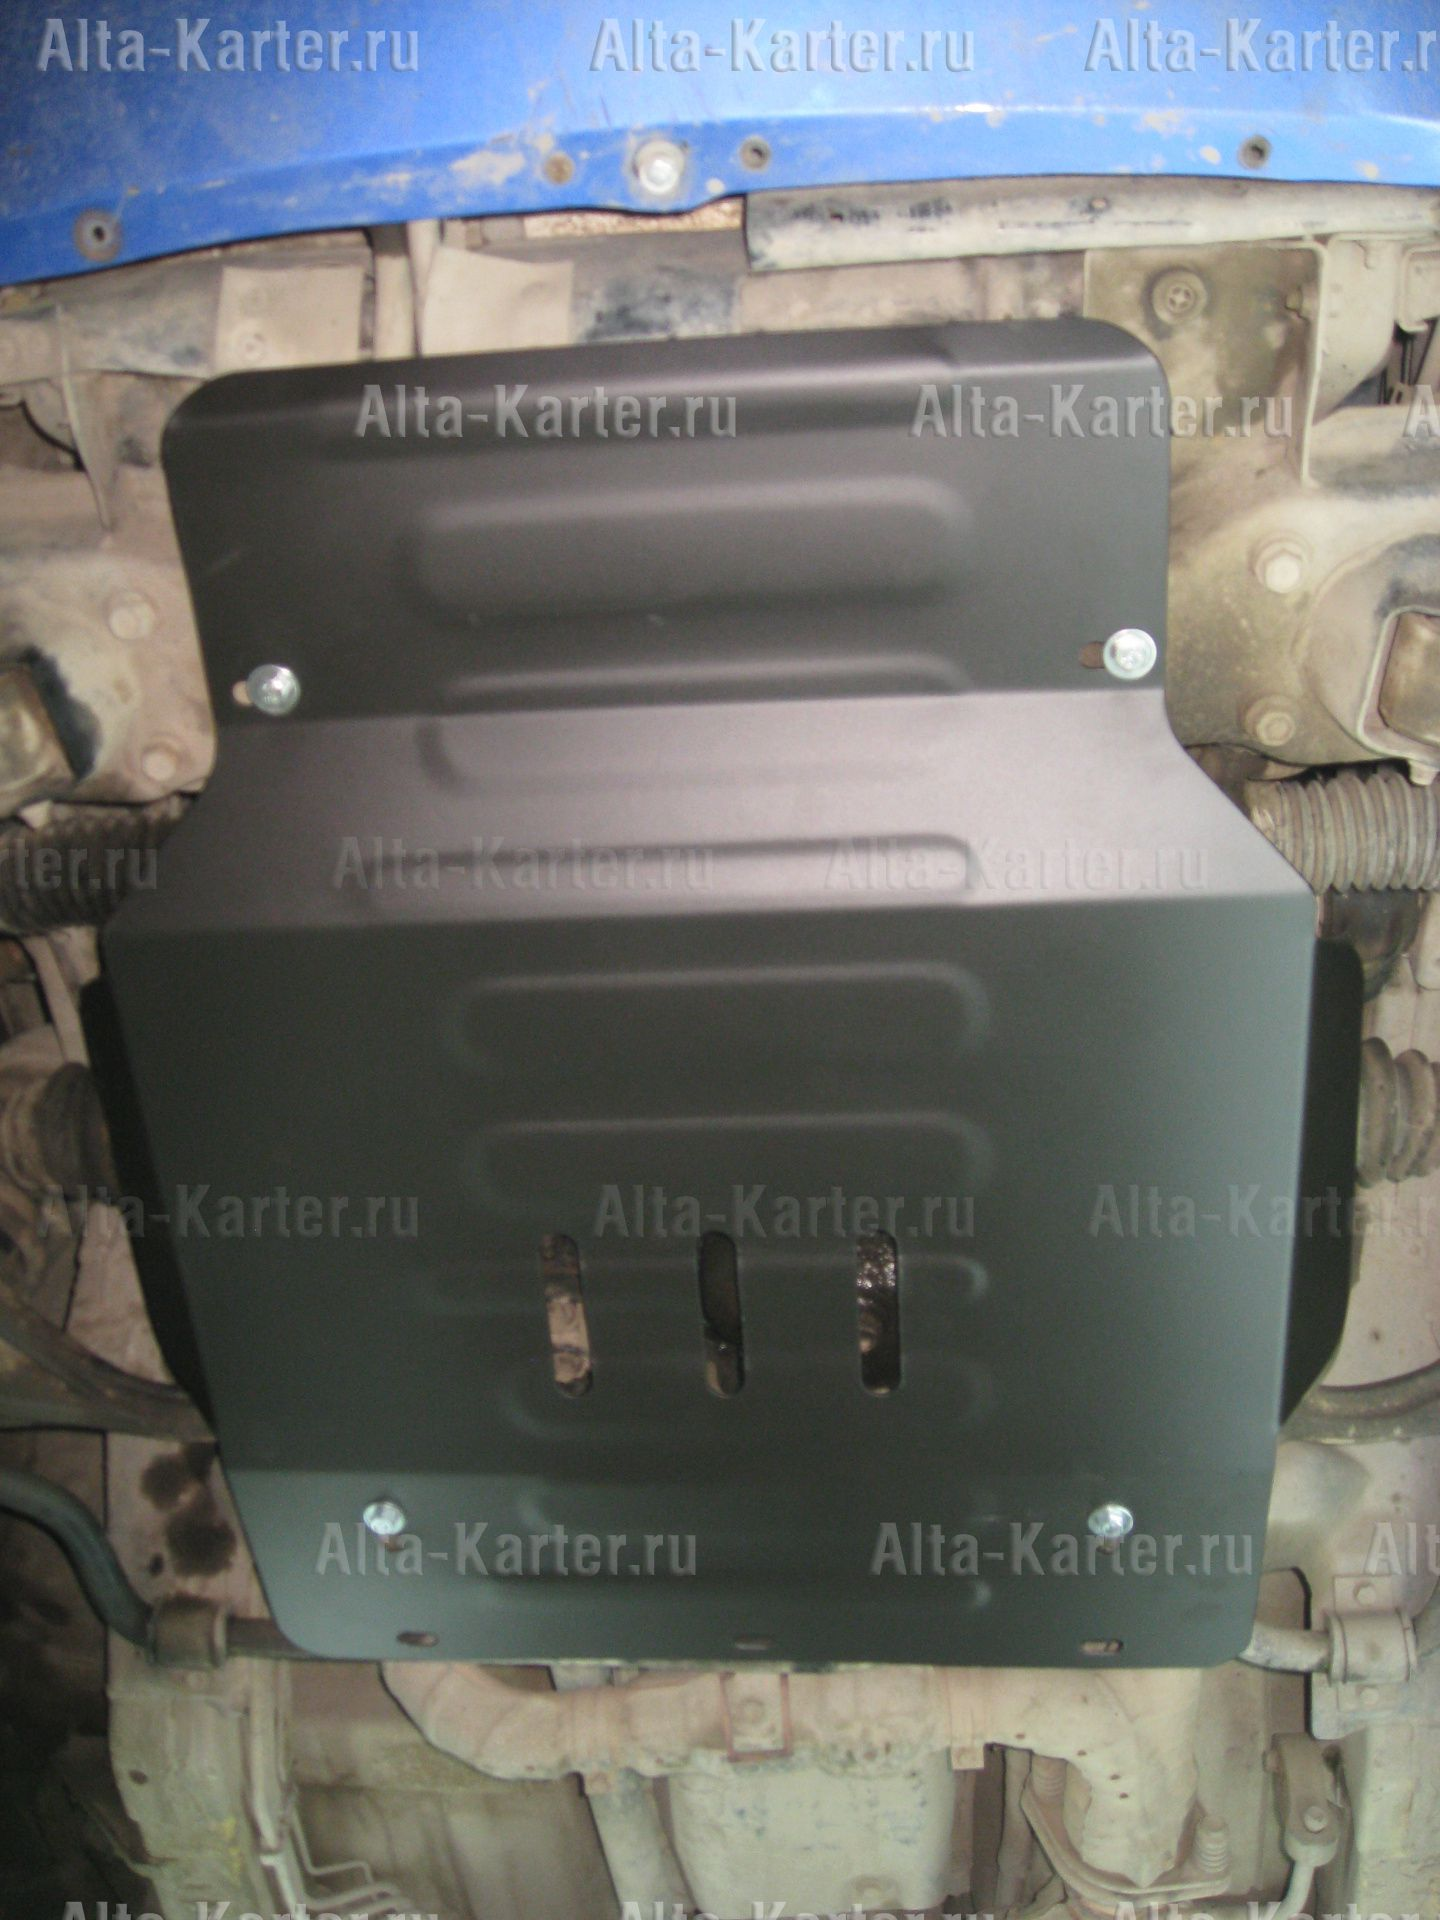 Защита Alfeco для картера Suzuki Escudo II 1997-2005. Артикул ALF.23.12